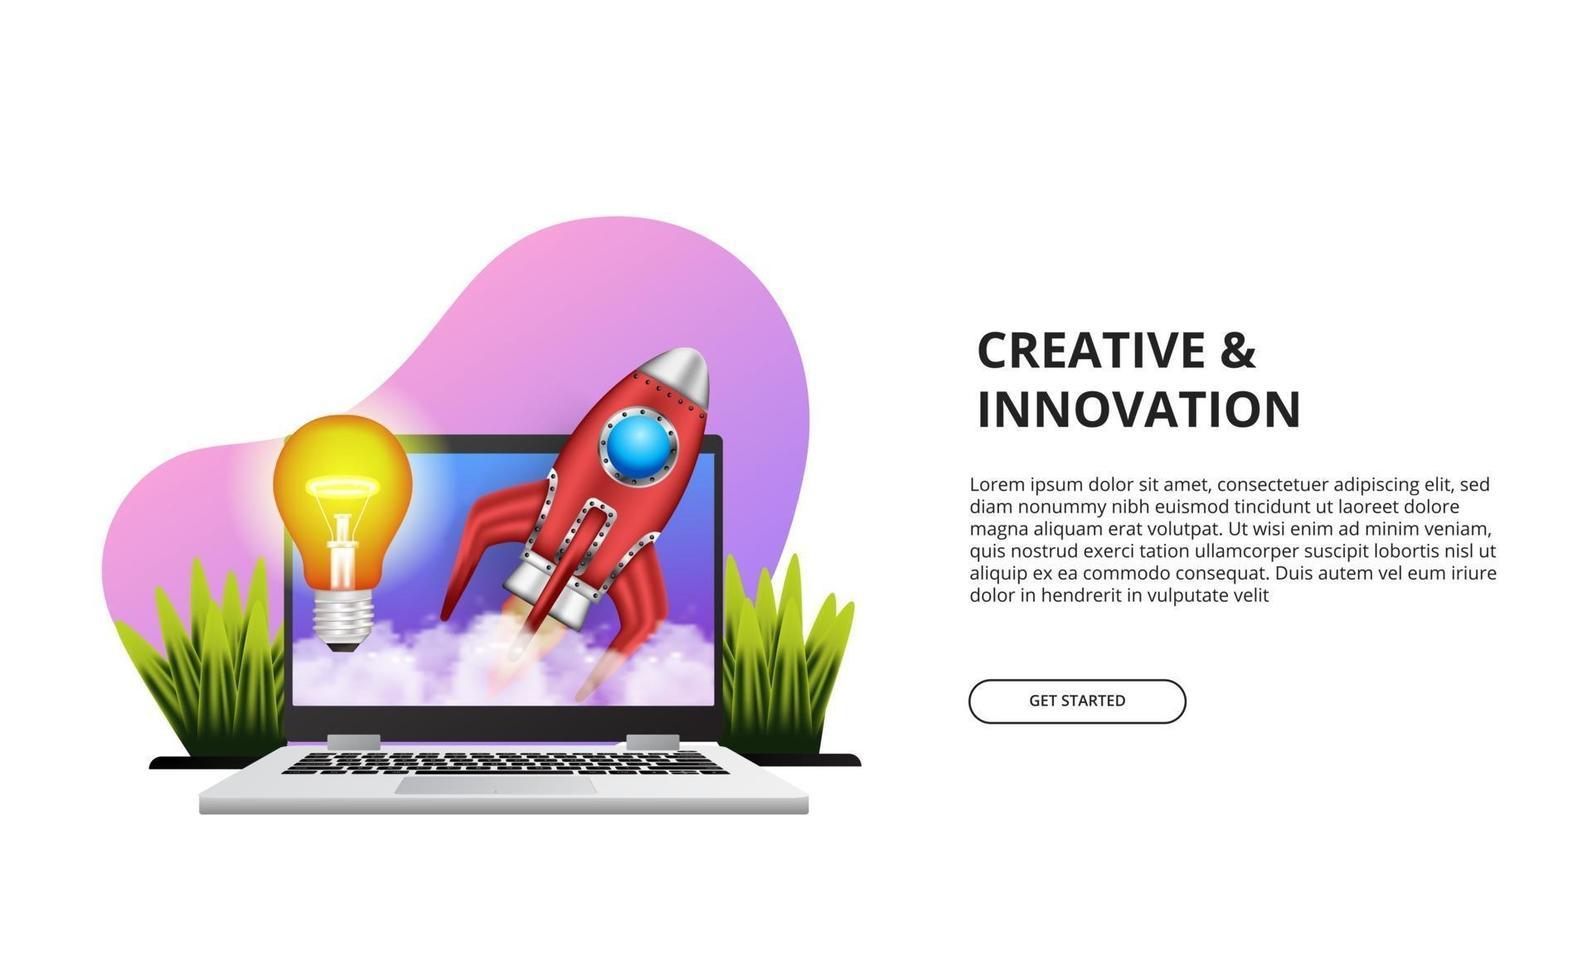 Start up creative innovation concept with illustration of laptop, rocket, light. vector